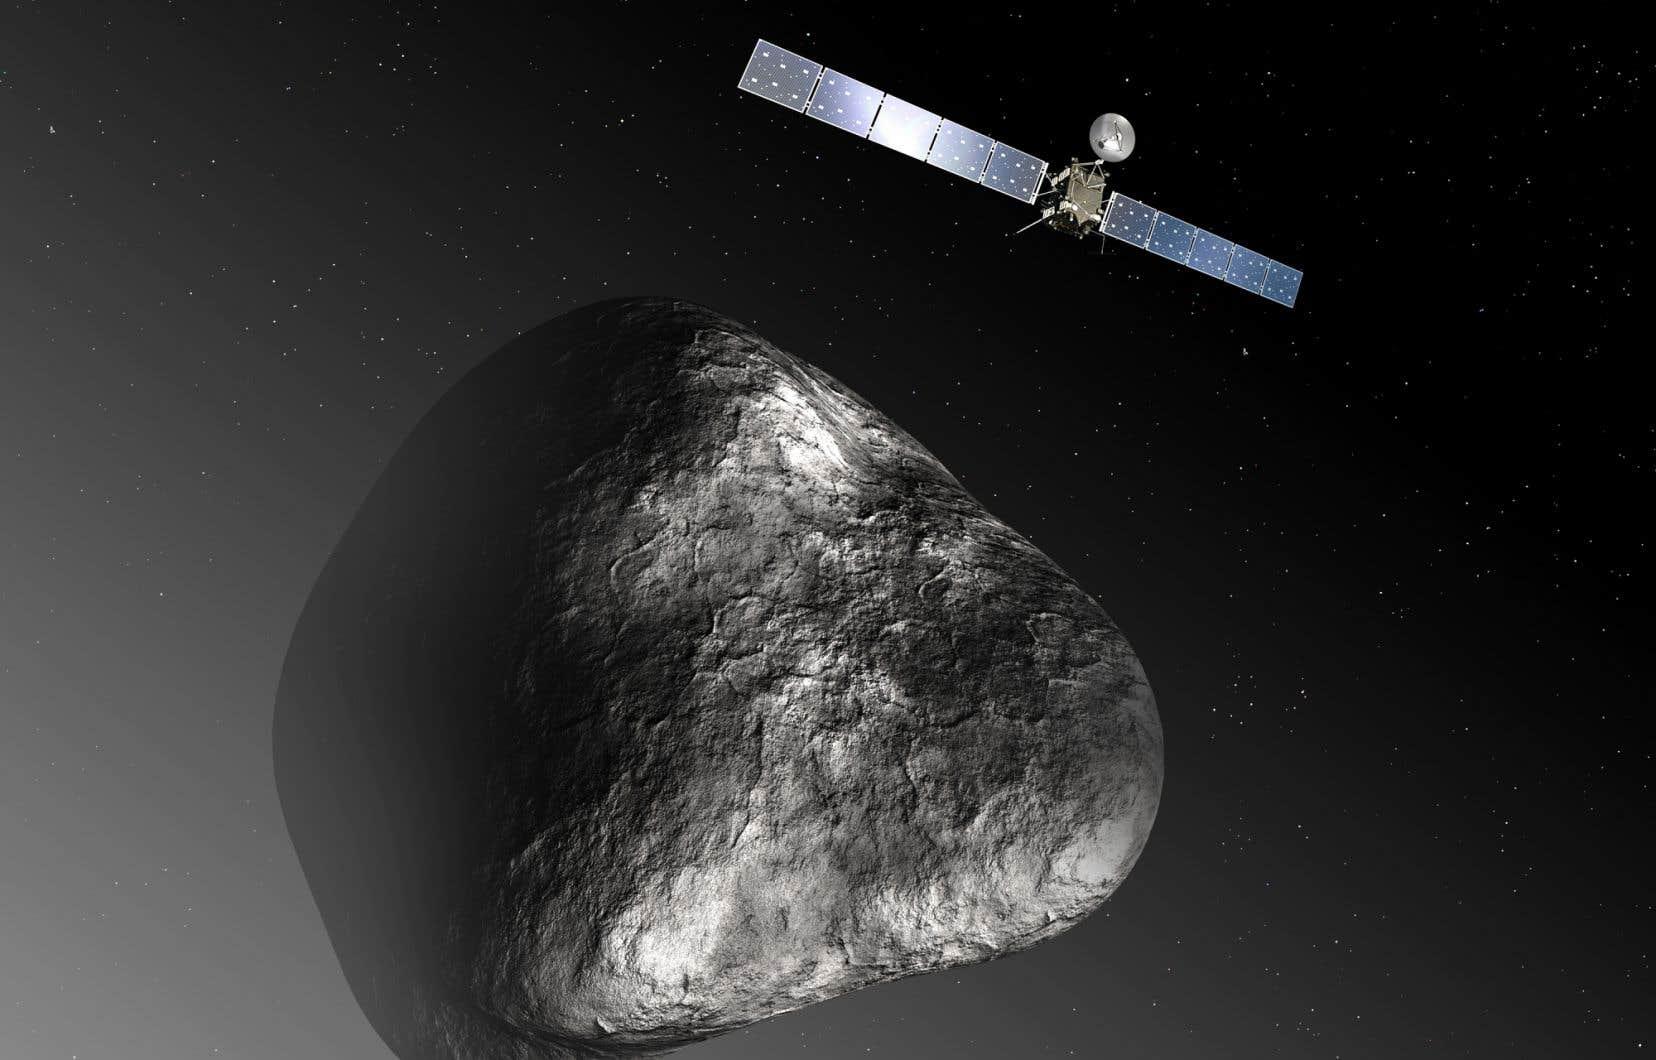 La sonde Rosetta (vue d'artiste) devant le noyau de la comète 67P Tchourioumov-Guérassimenko